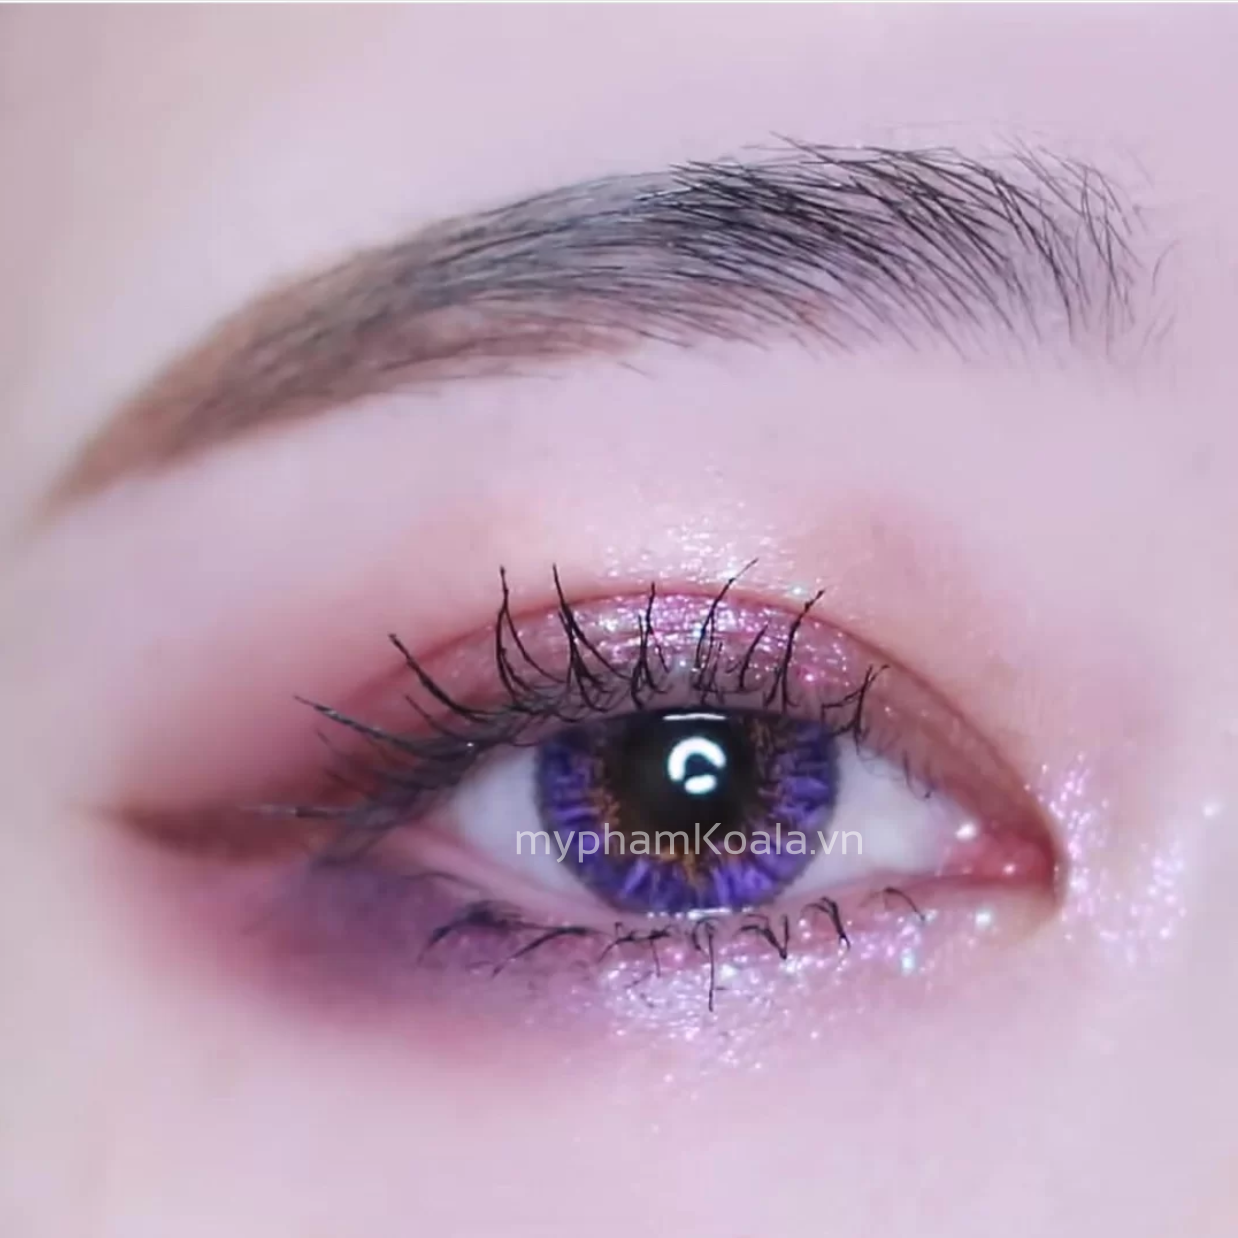 Bảng Màu Mắt 10 ô Etude House Play Color Eyes #Lavender Land